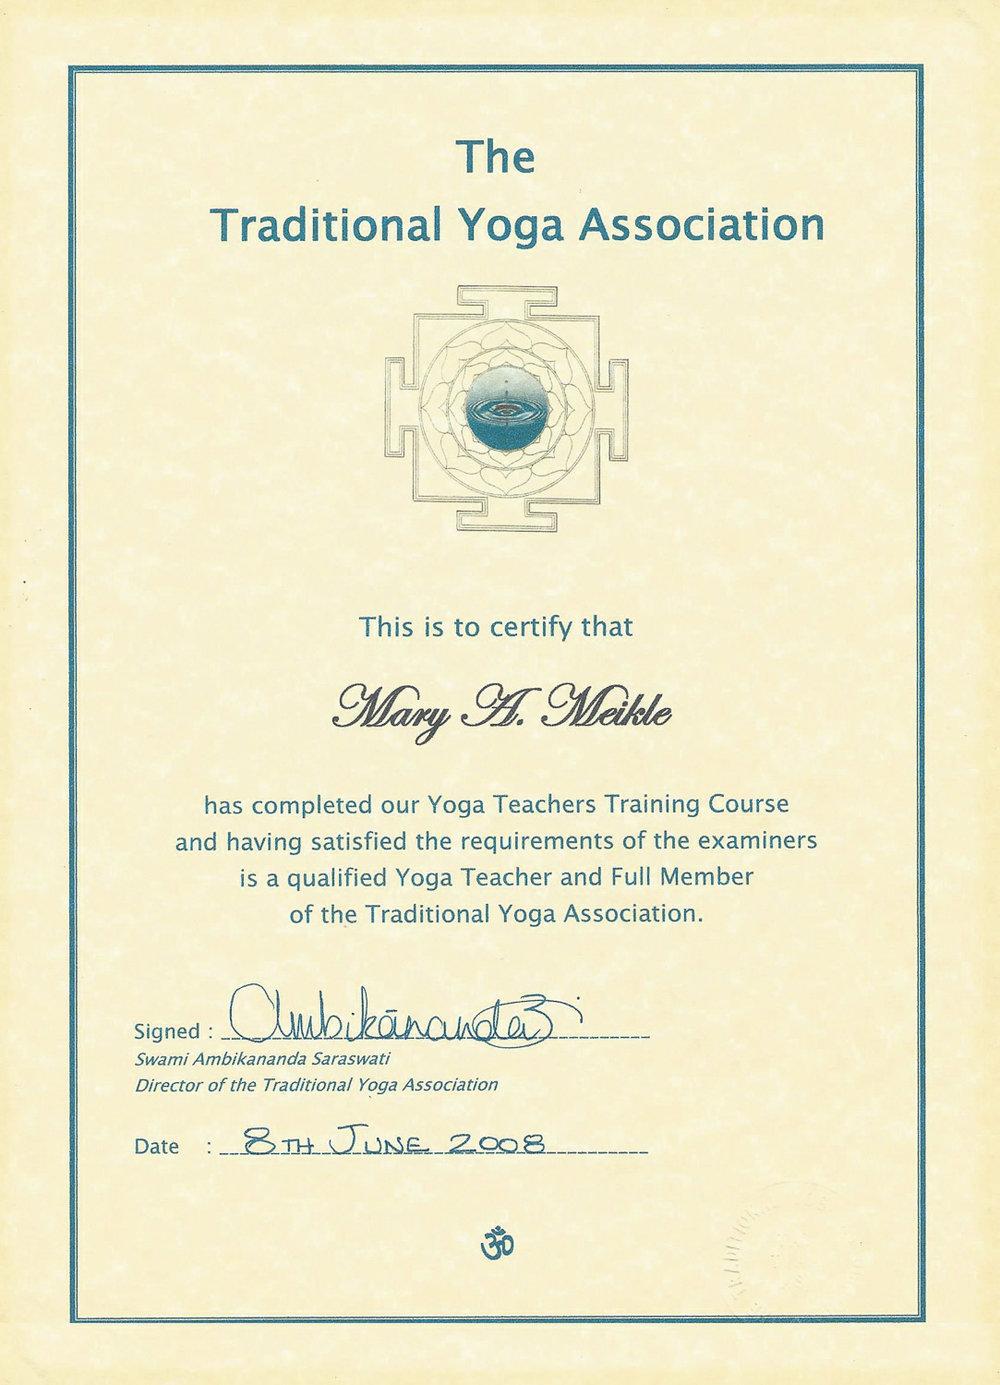 TYA teaching certificate